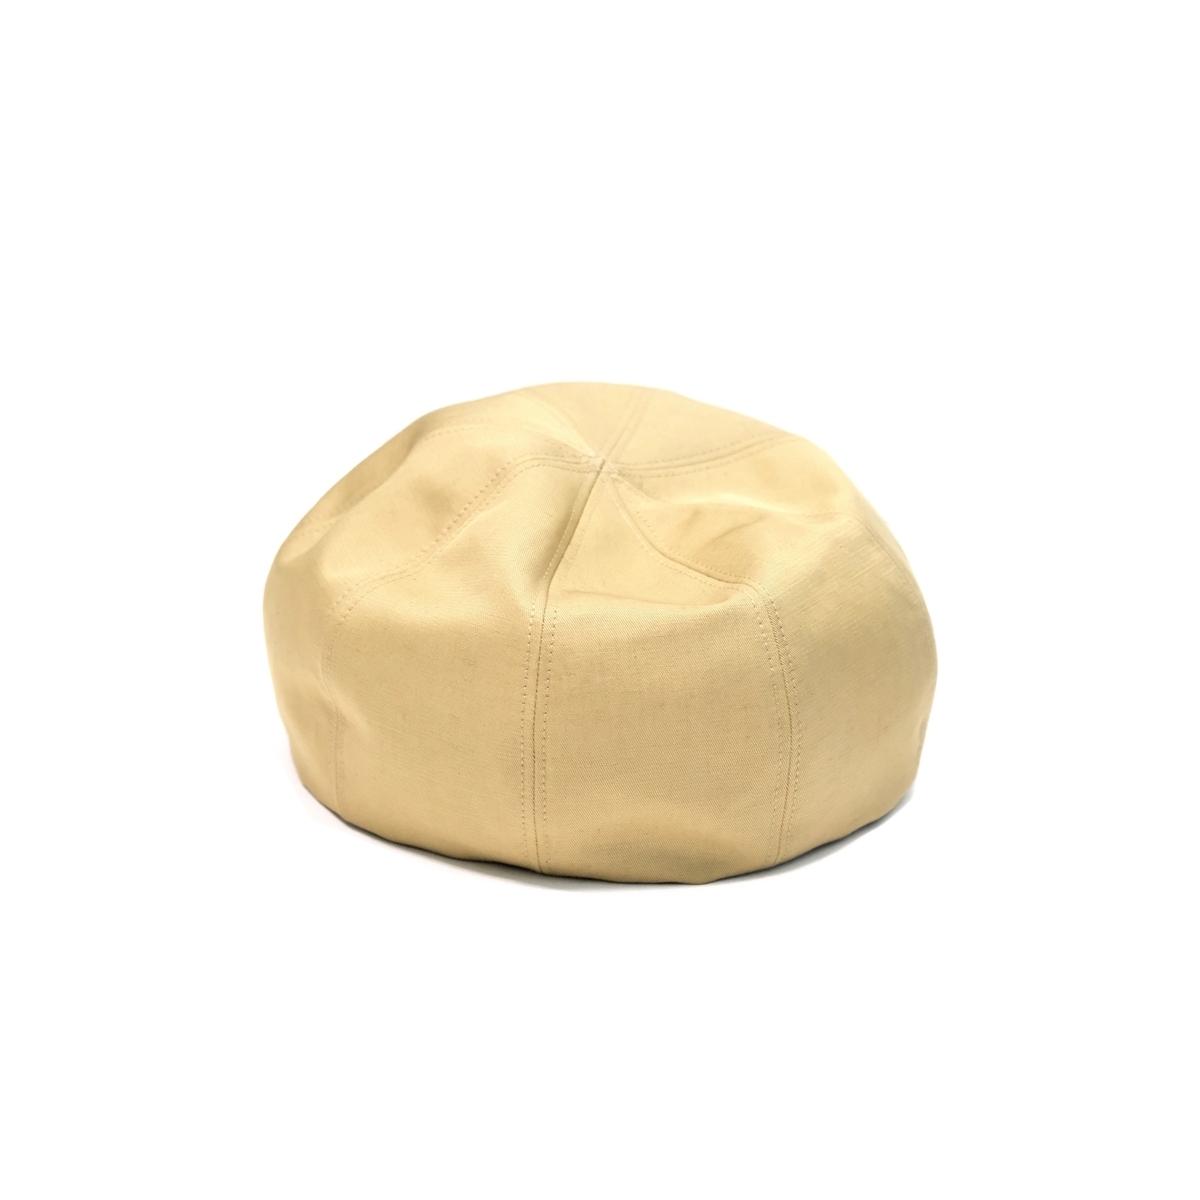 UNITUS Mini Belet (Beige) UTSSS18-A02 ユナイタス ベレー帽 リネン コットン 綿麻 帽子 日本製 送料無料